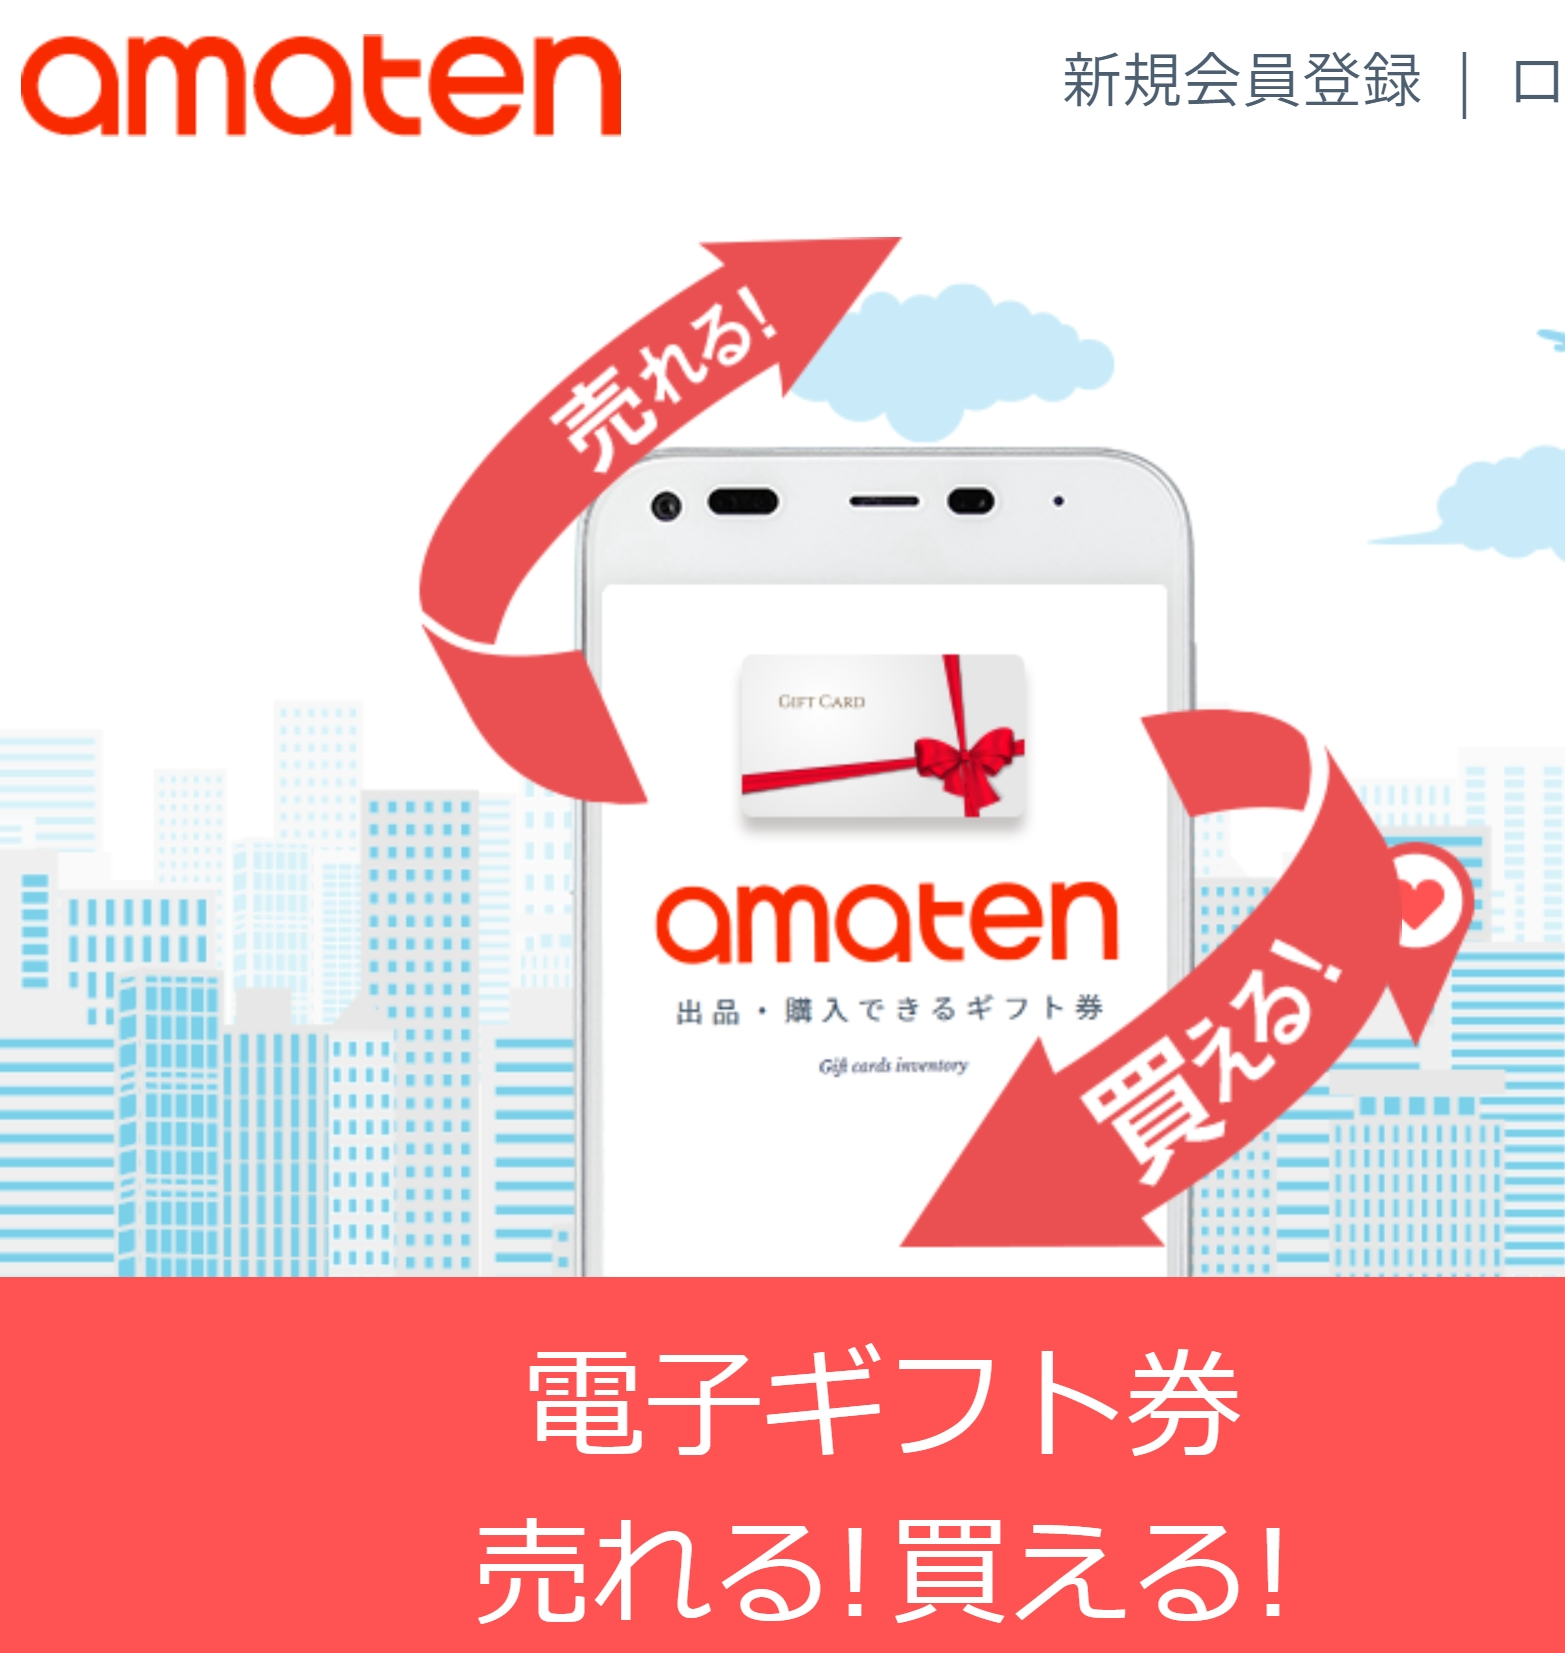 amatenサイトのトップページ